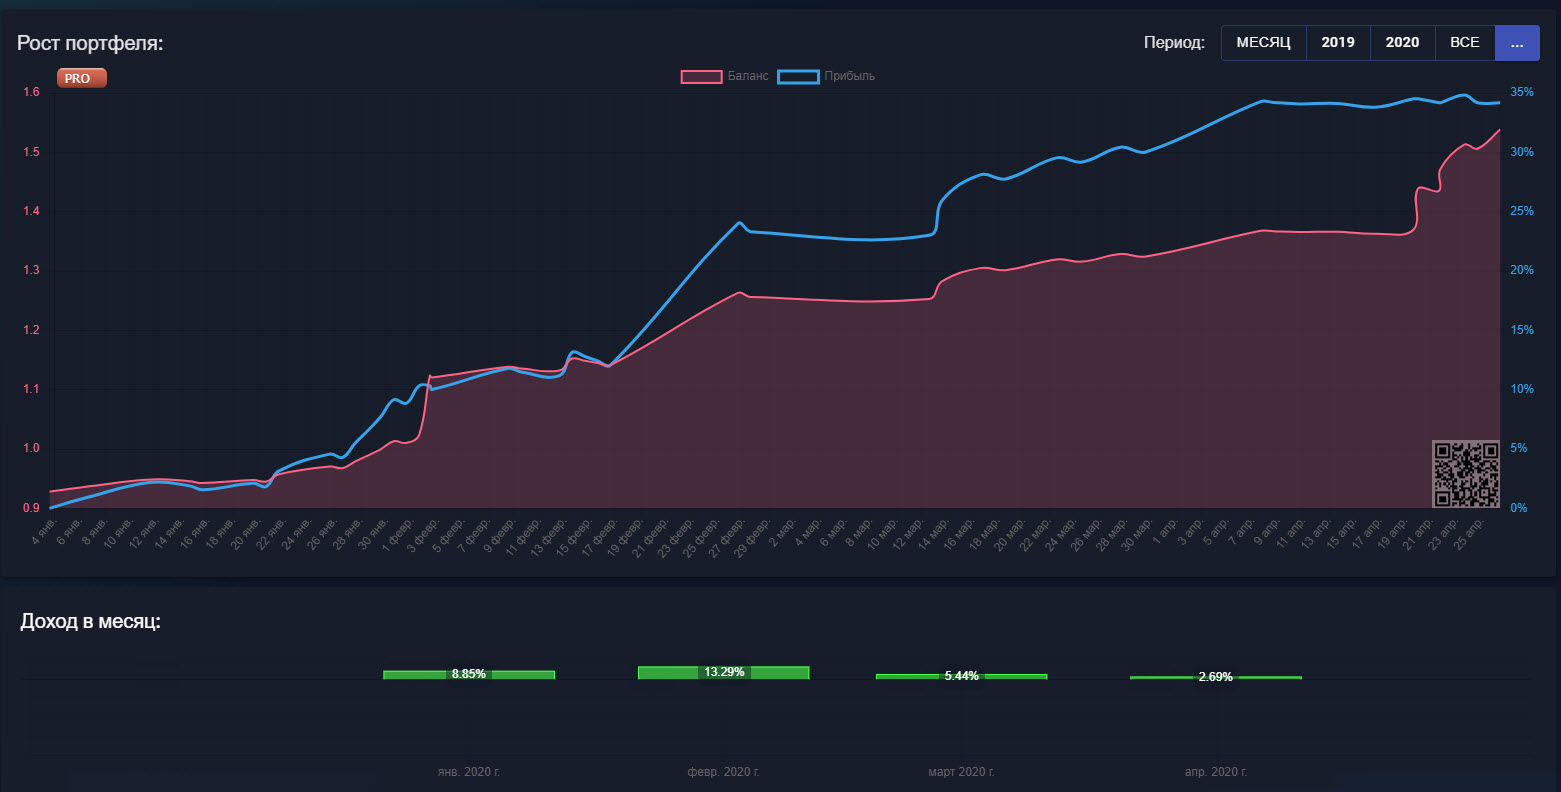 Мониторинг бота для парного трейдинга на Bitmex